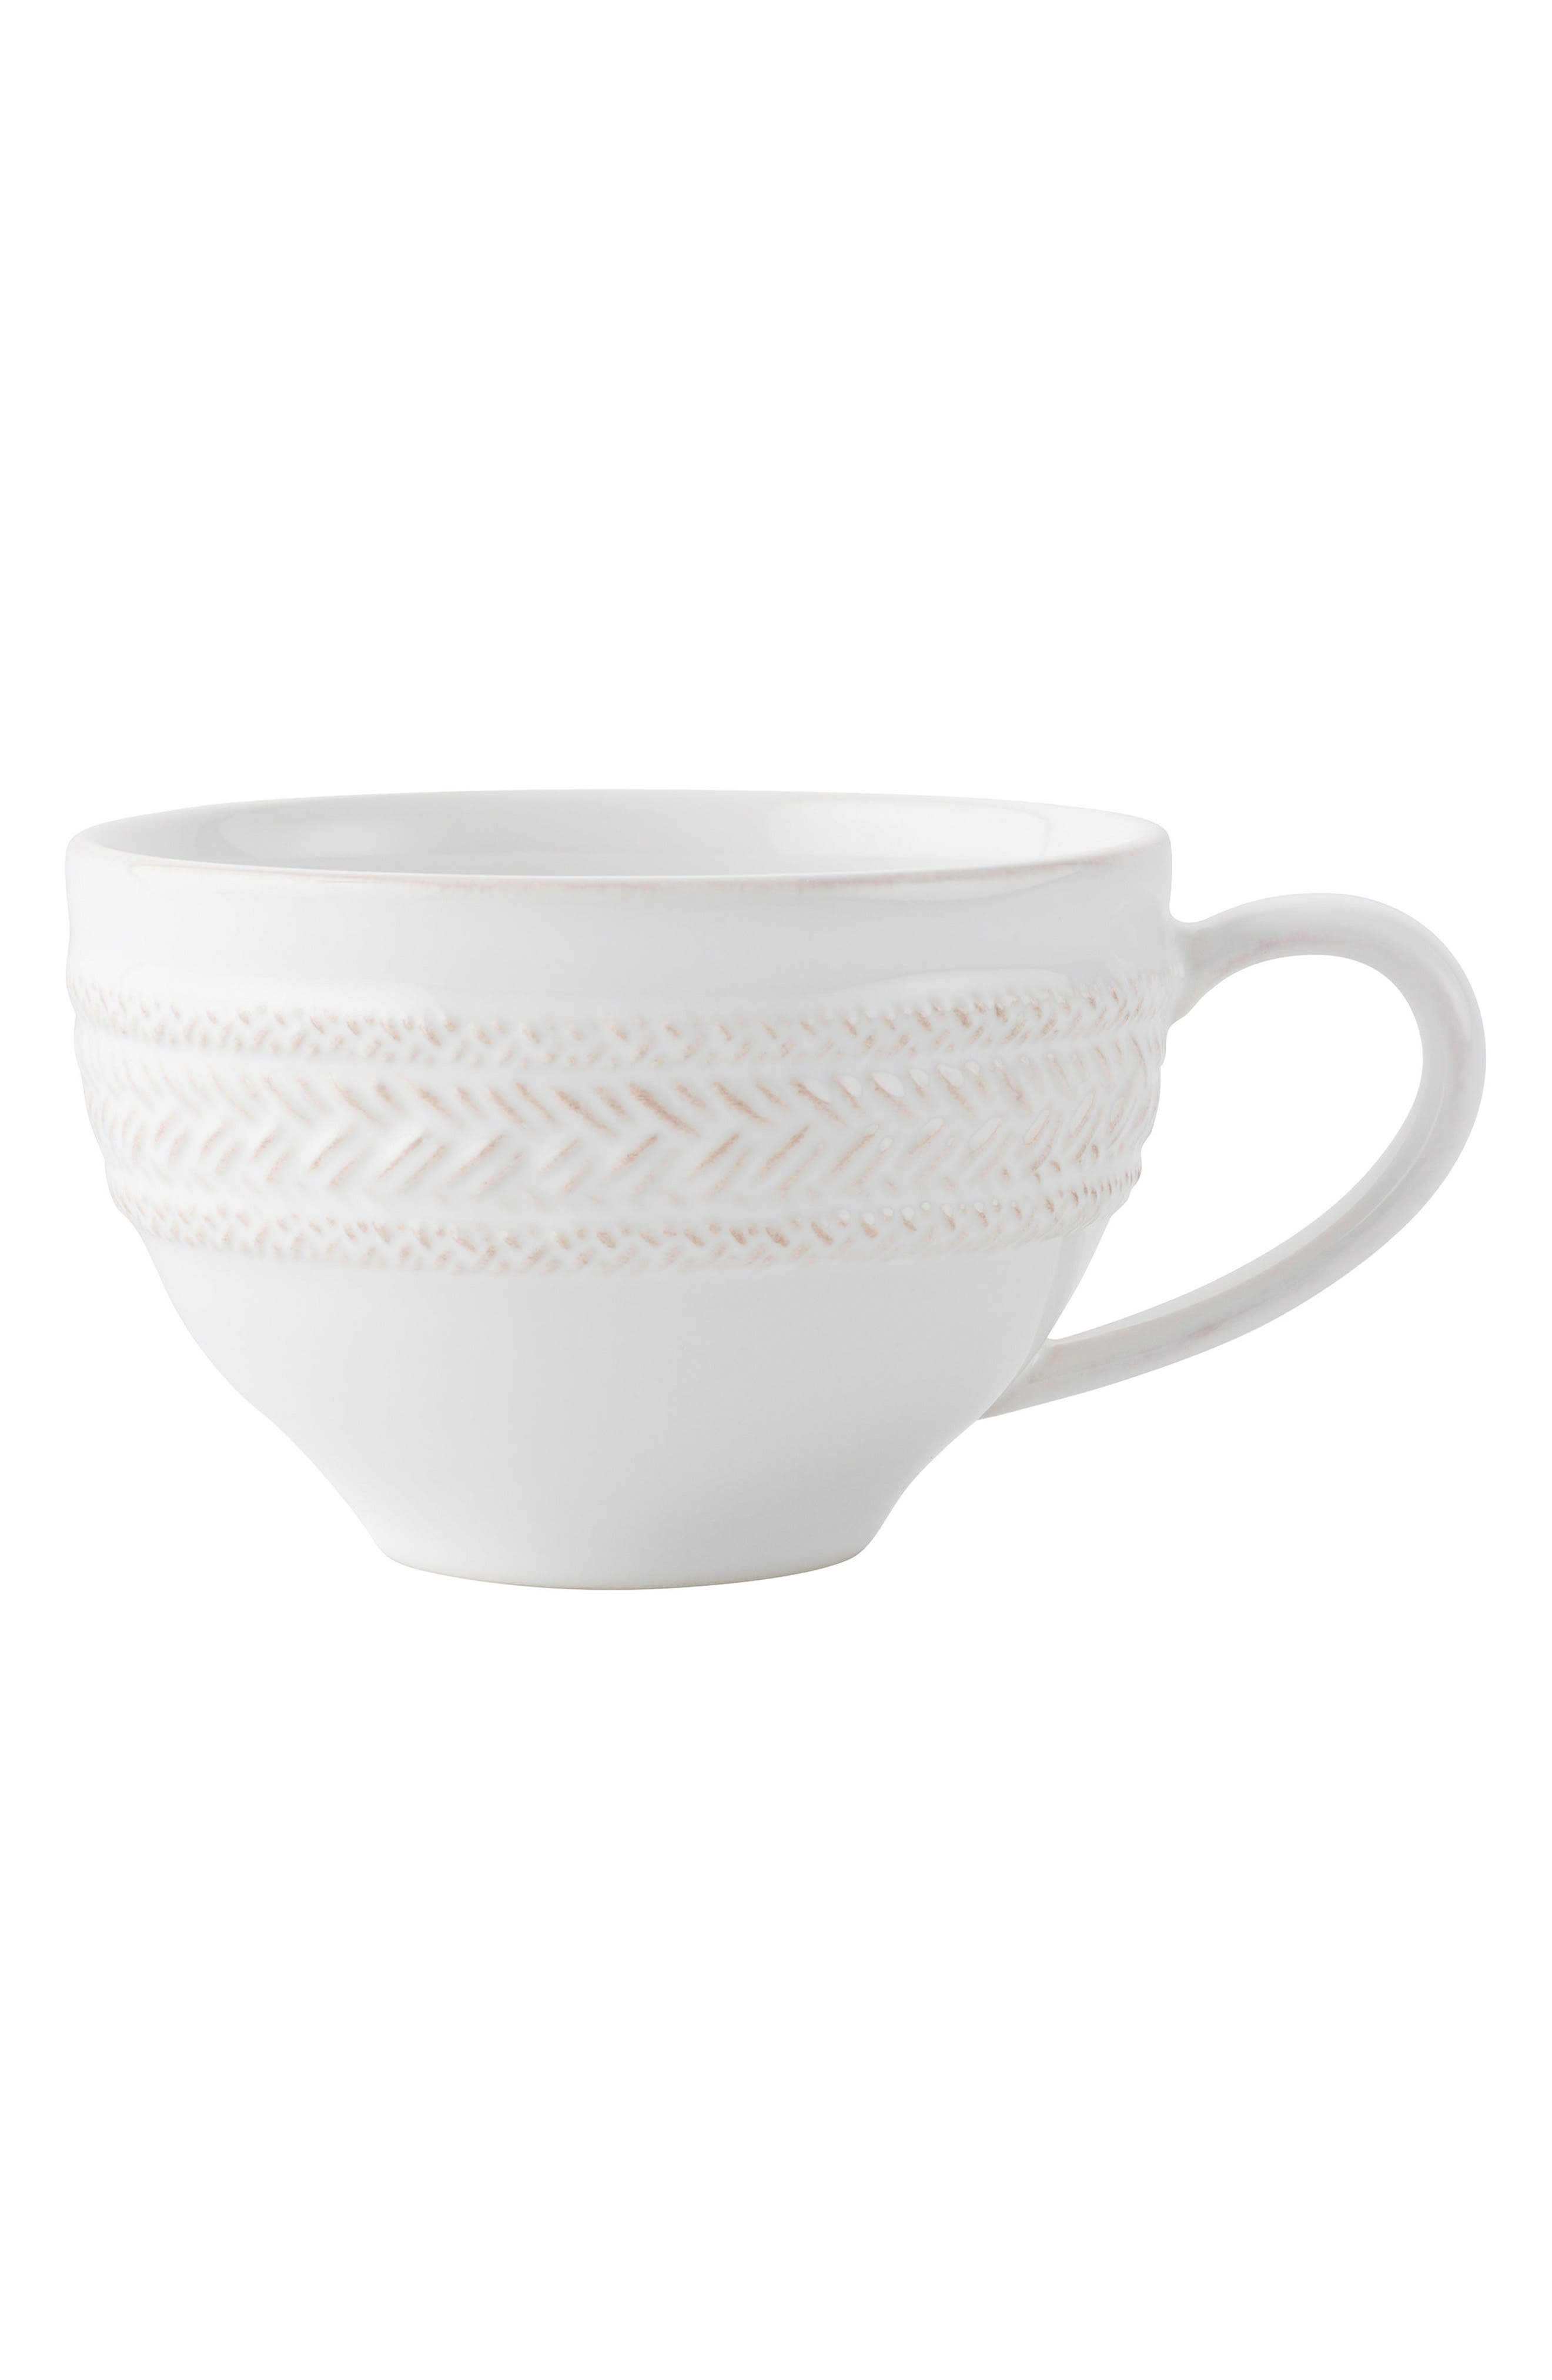 Juliska Le Panier Whitewash Coffee Cup